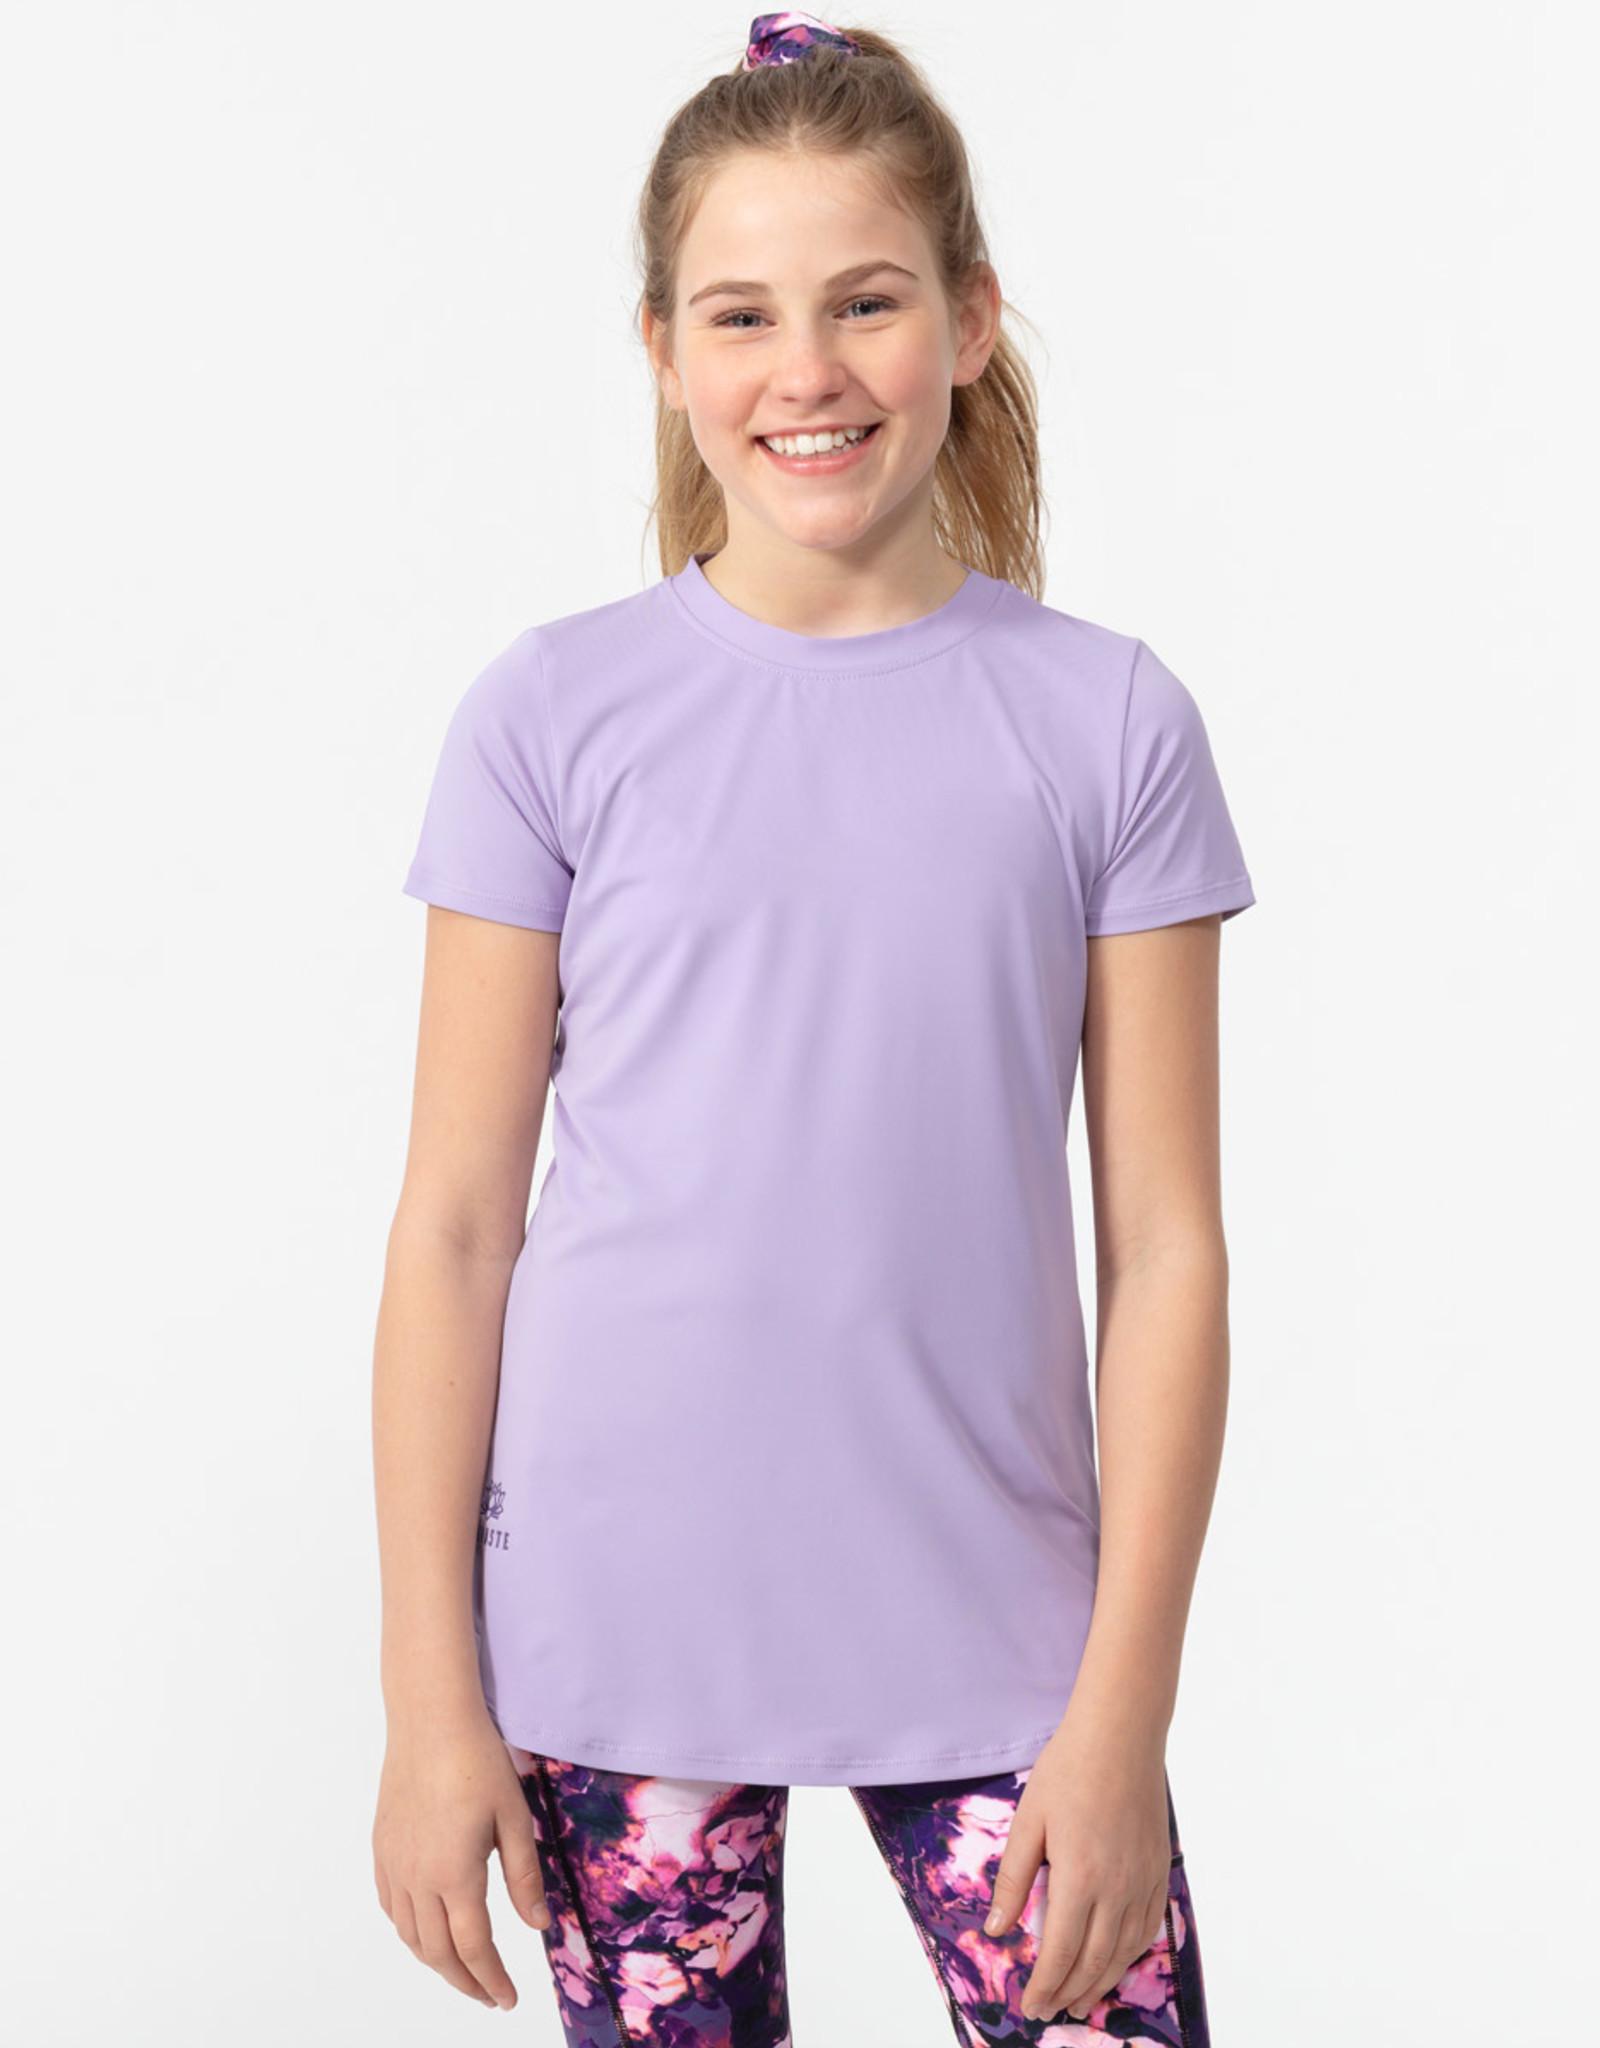 SP21 G Yth Lilac T-Shirt